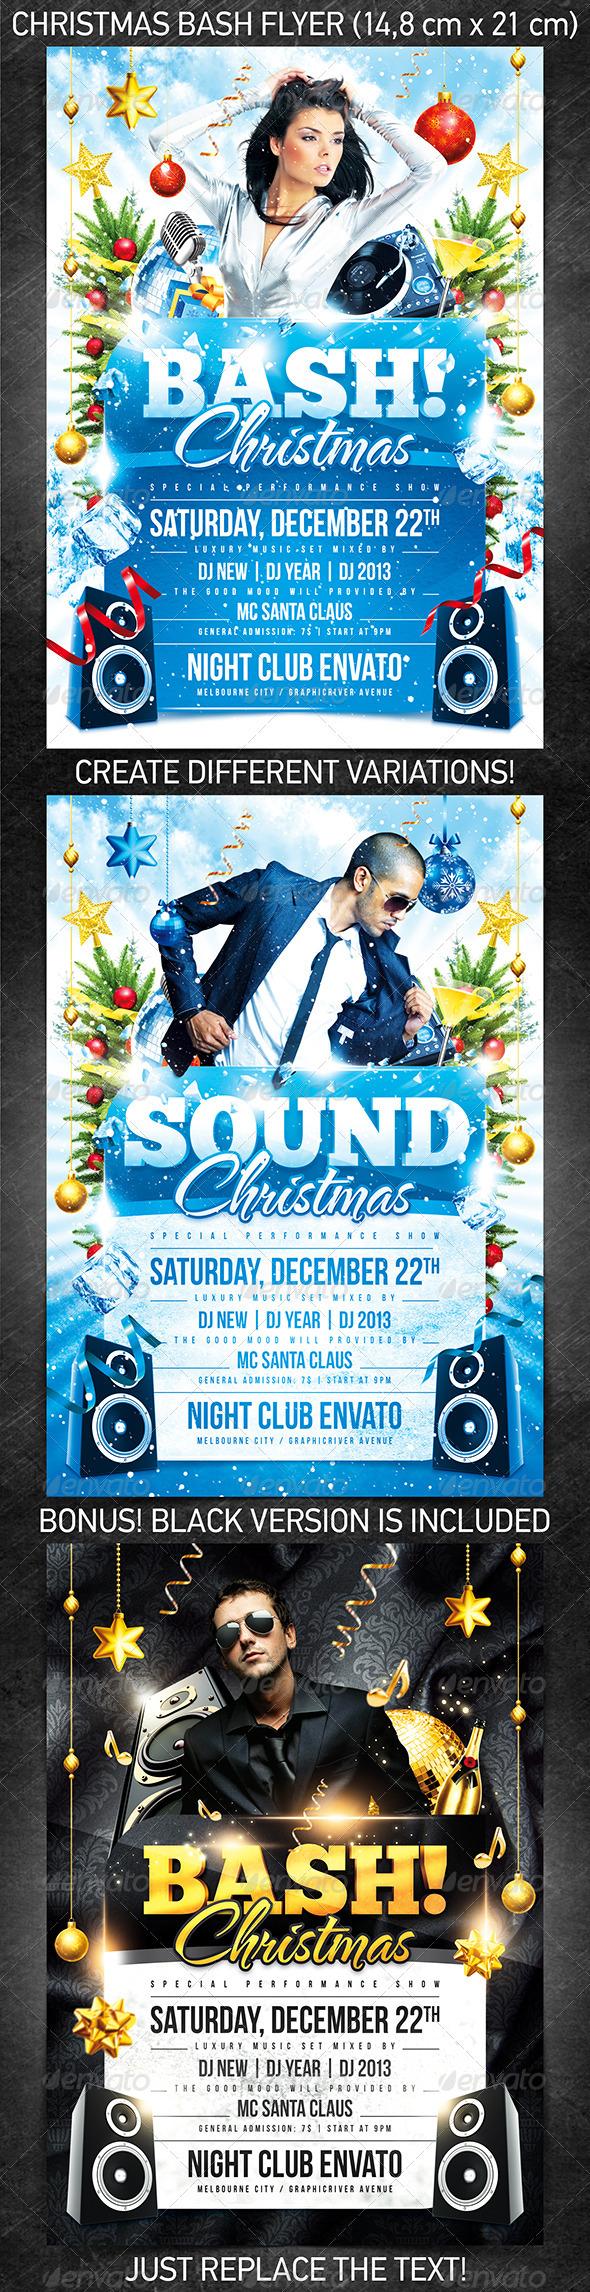 Christmas Bash Flyer Template - Holidays Events